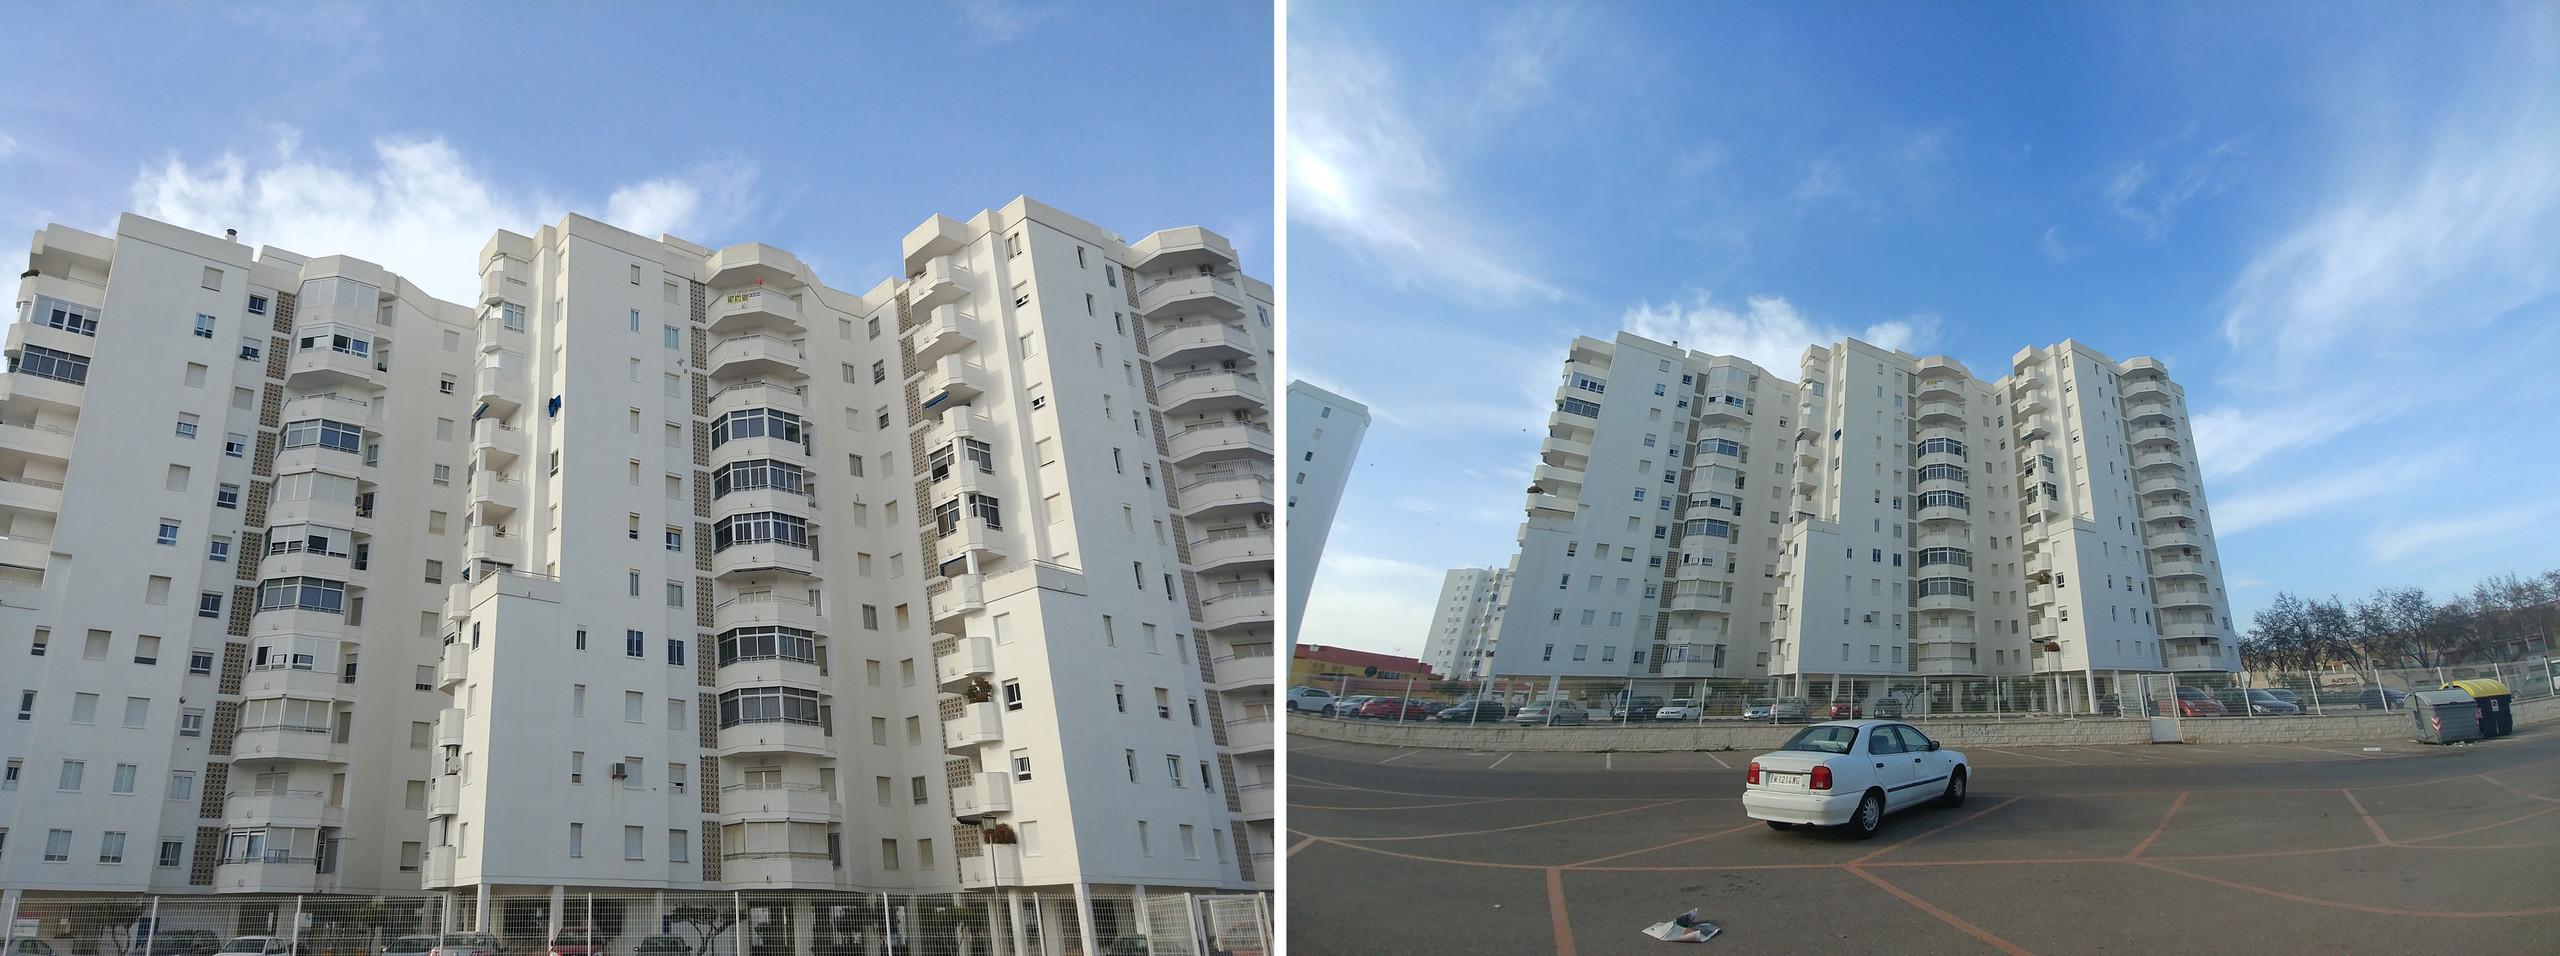 Foto de LG G6: cámara principal vs angular (8/9)